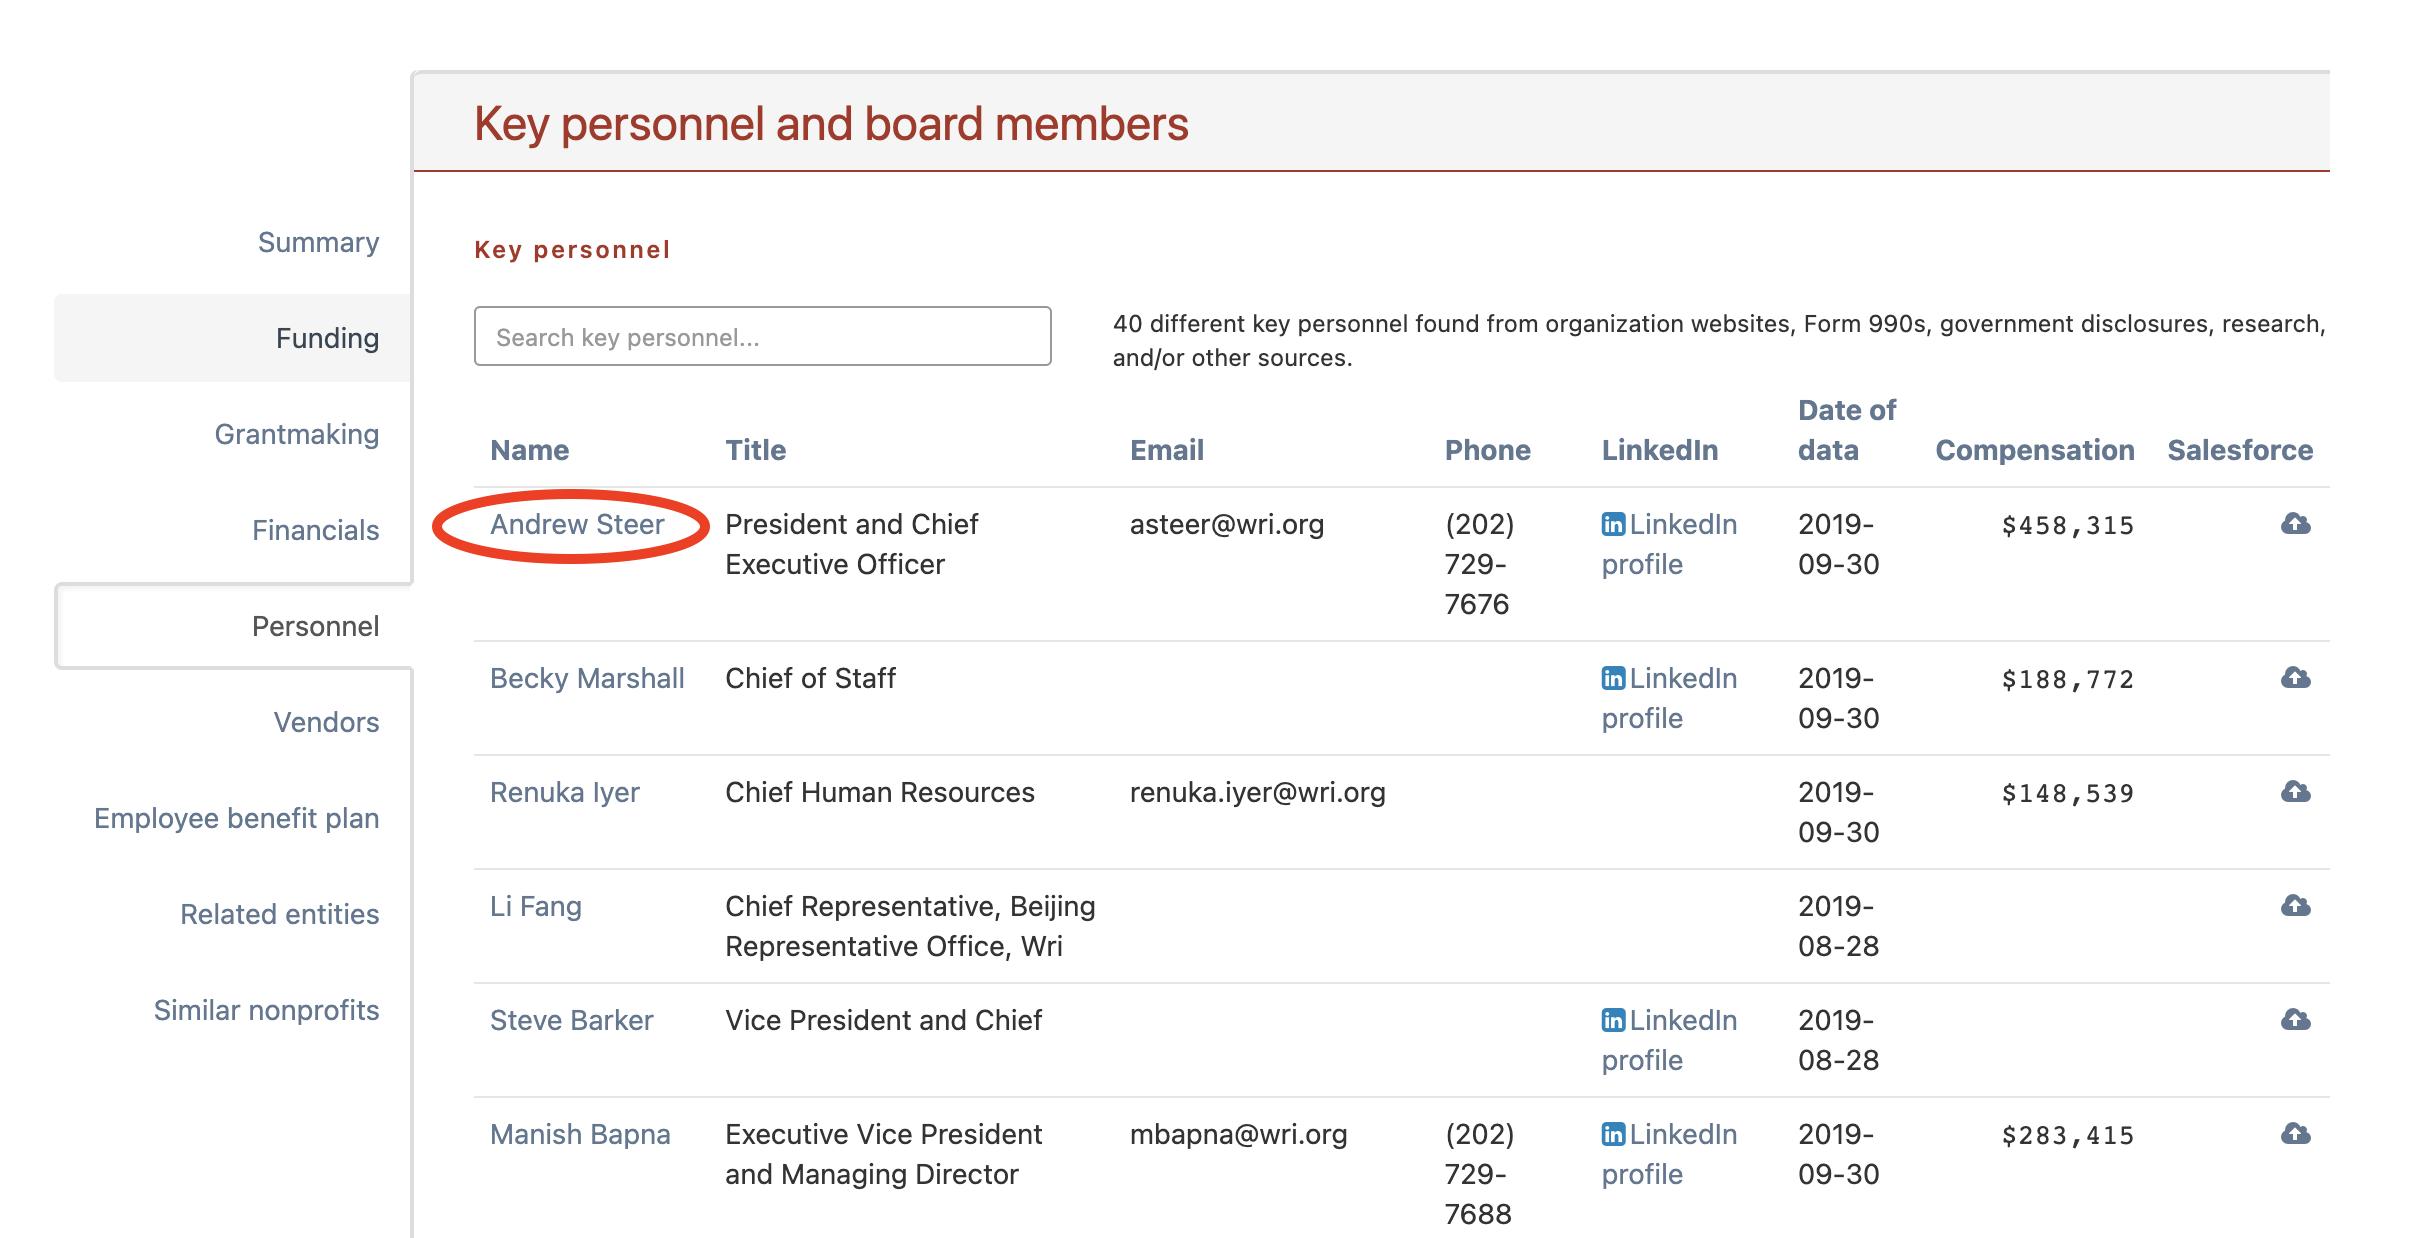 Accessing a personnel's profile